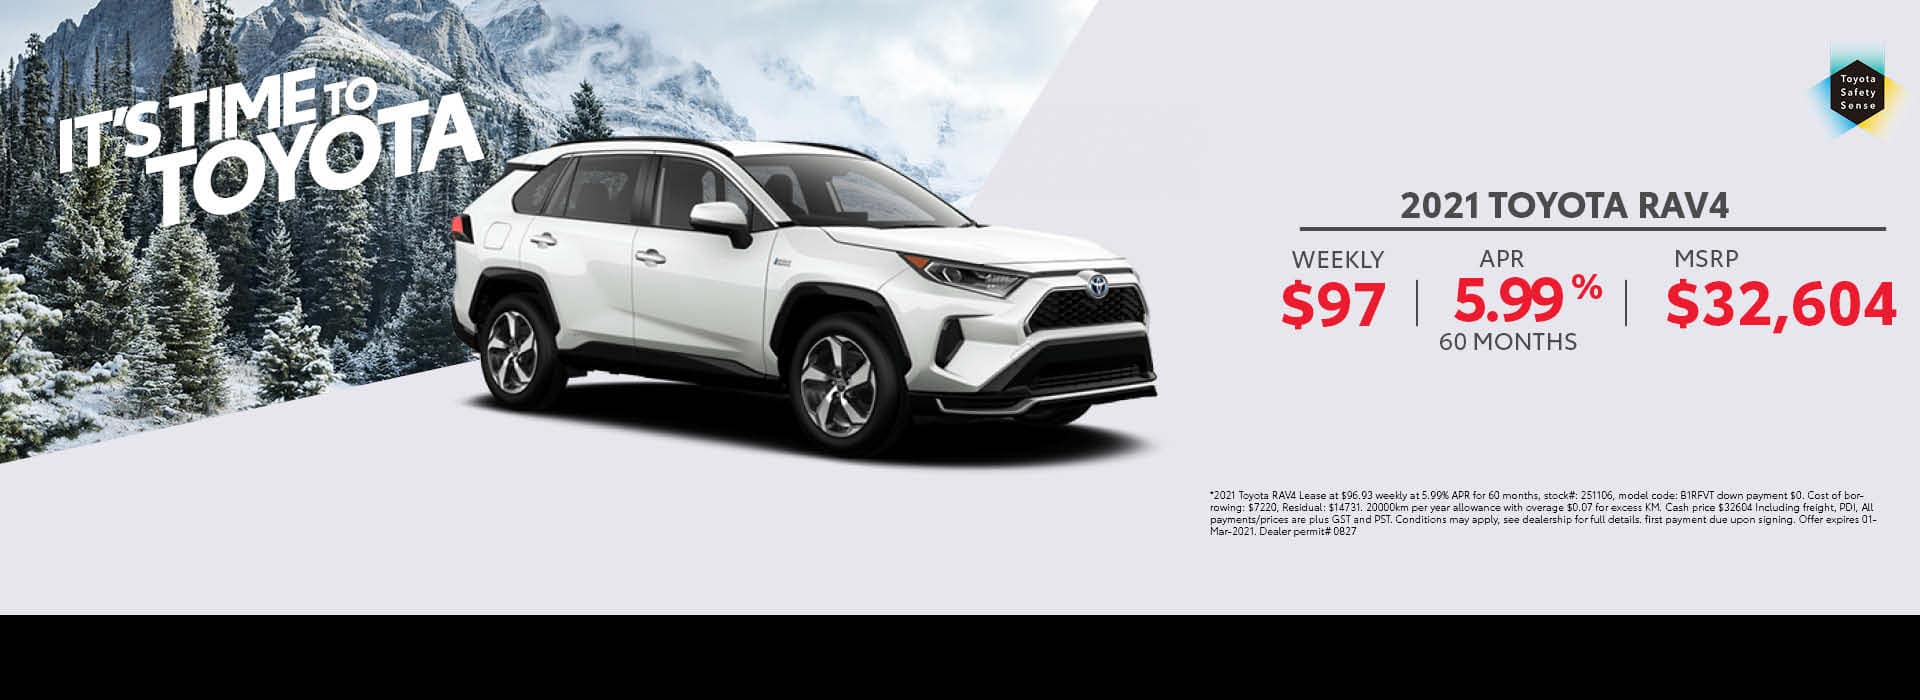 2021_Toyota_RAV4_Desktop_Home_Page_Banner_Feb20219